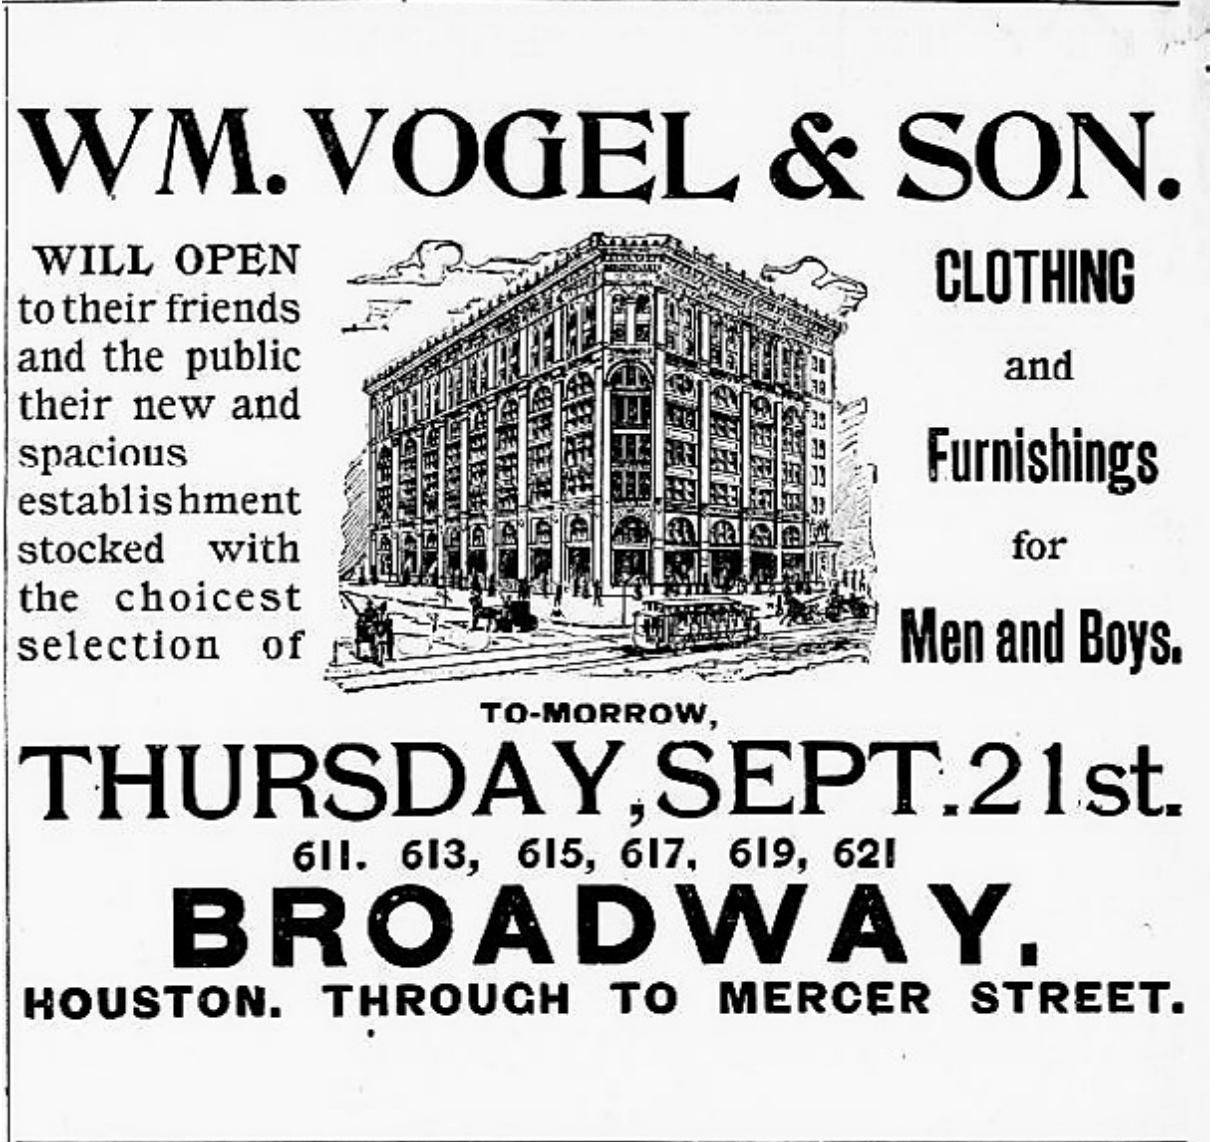 William Vogel & Son's Poster - Opening Date September 21, 1893